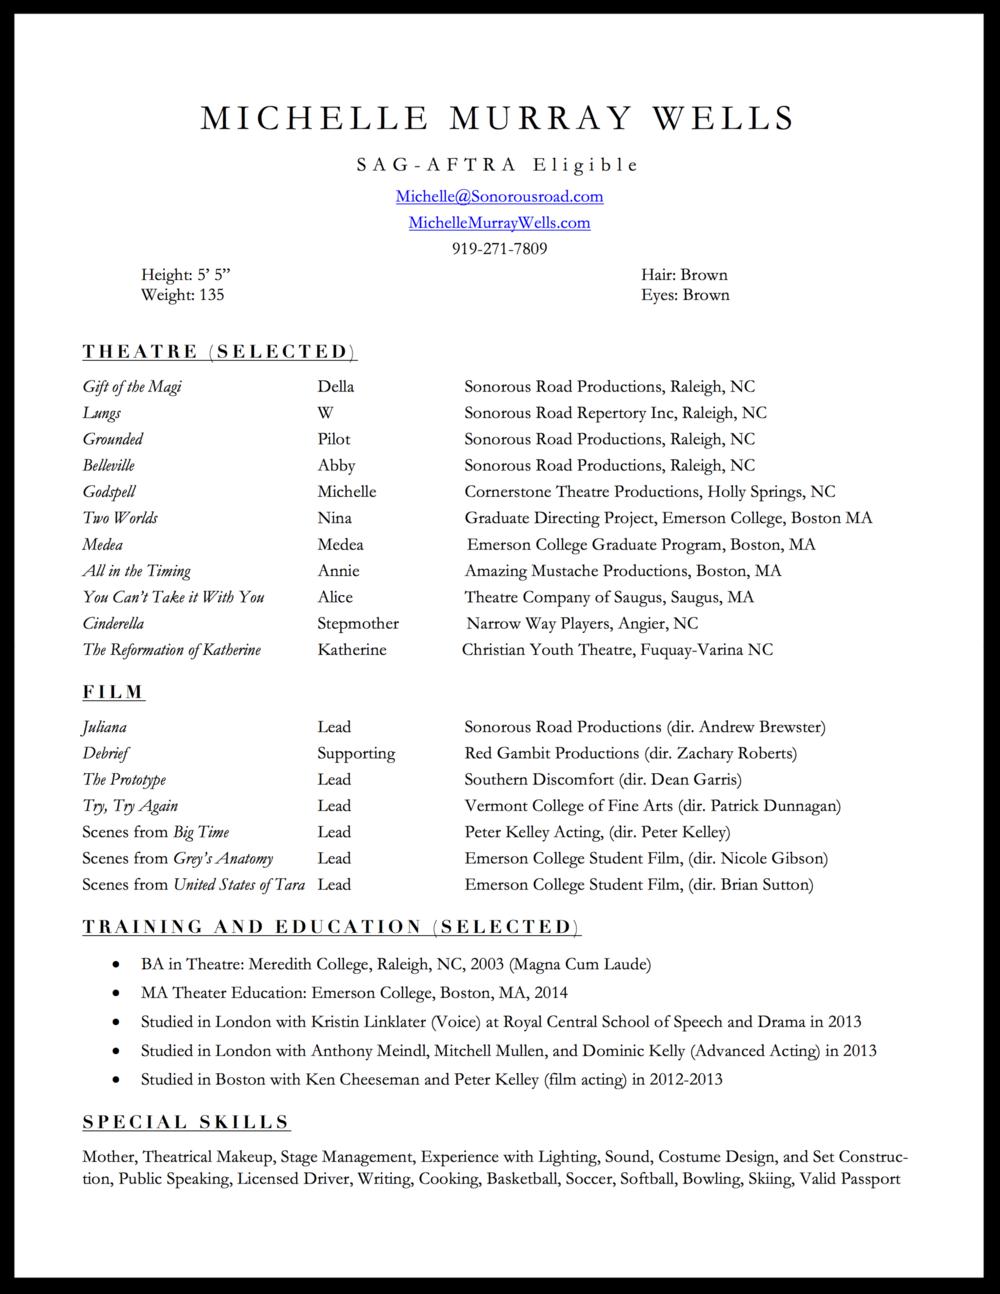 Microsoft Word - MichelleMurrayWellsActingResume2018.docx.png